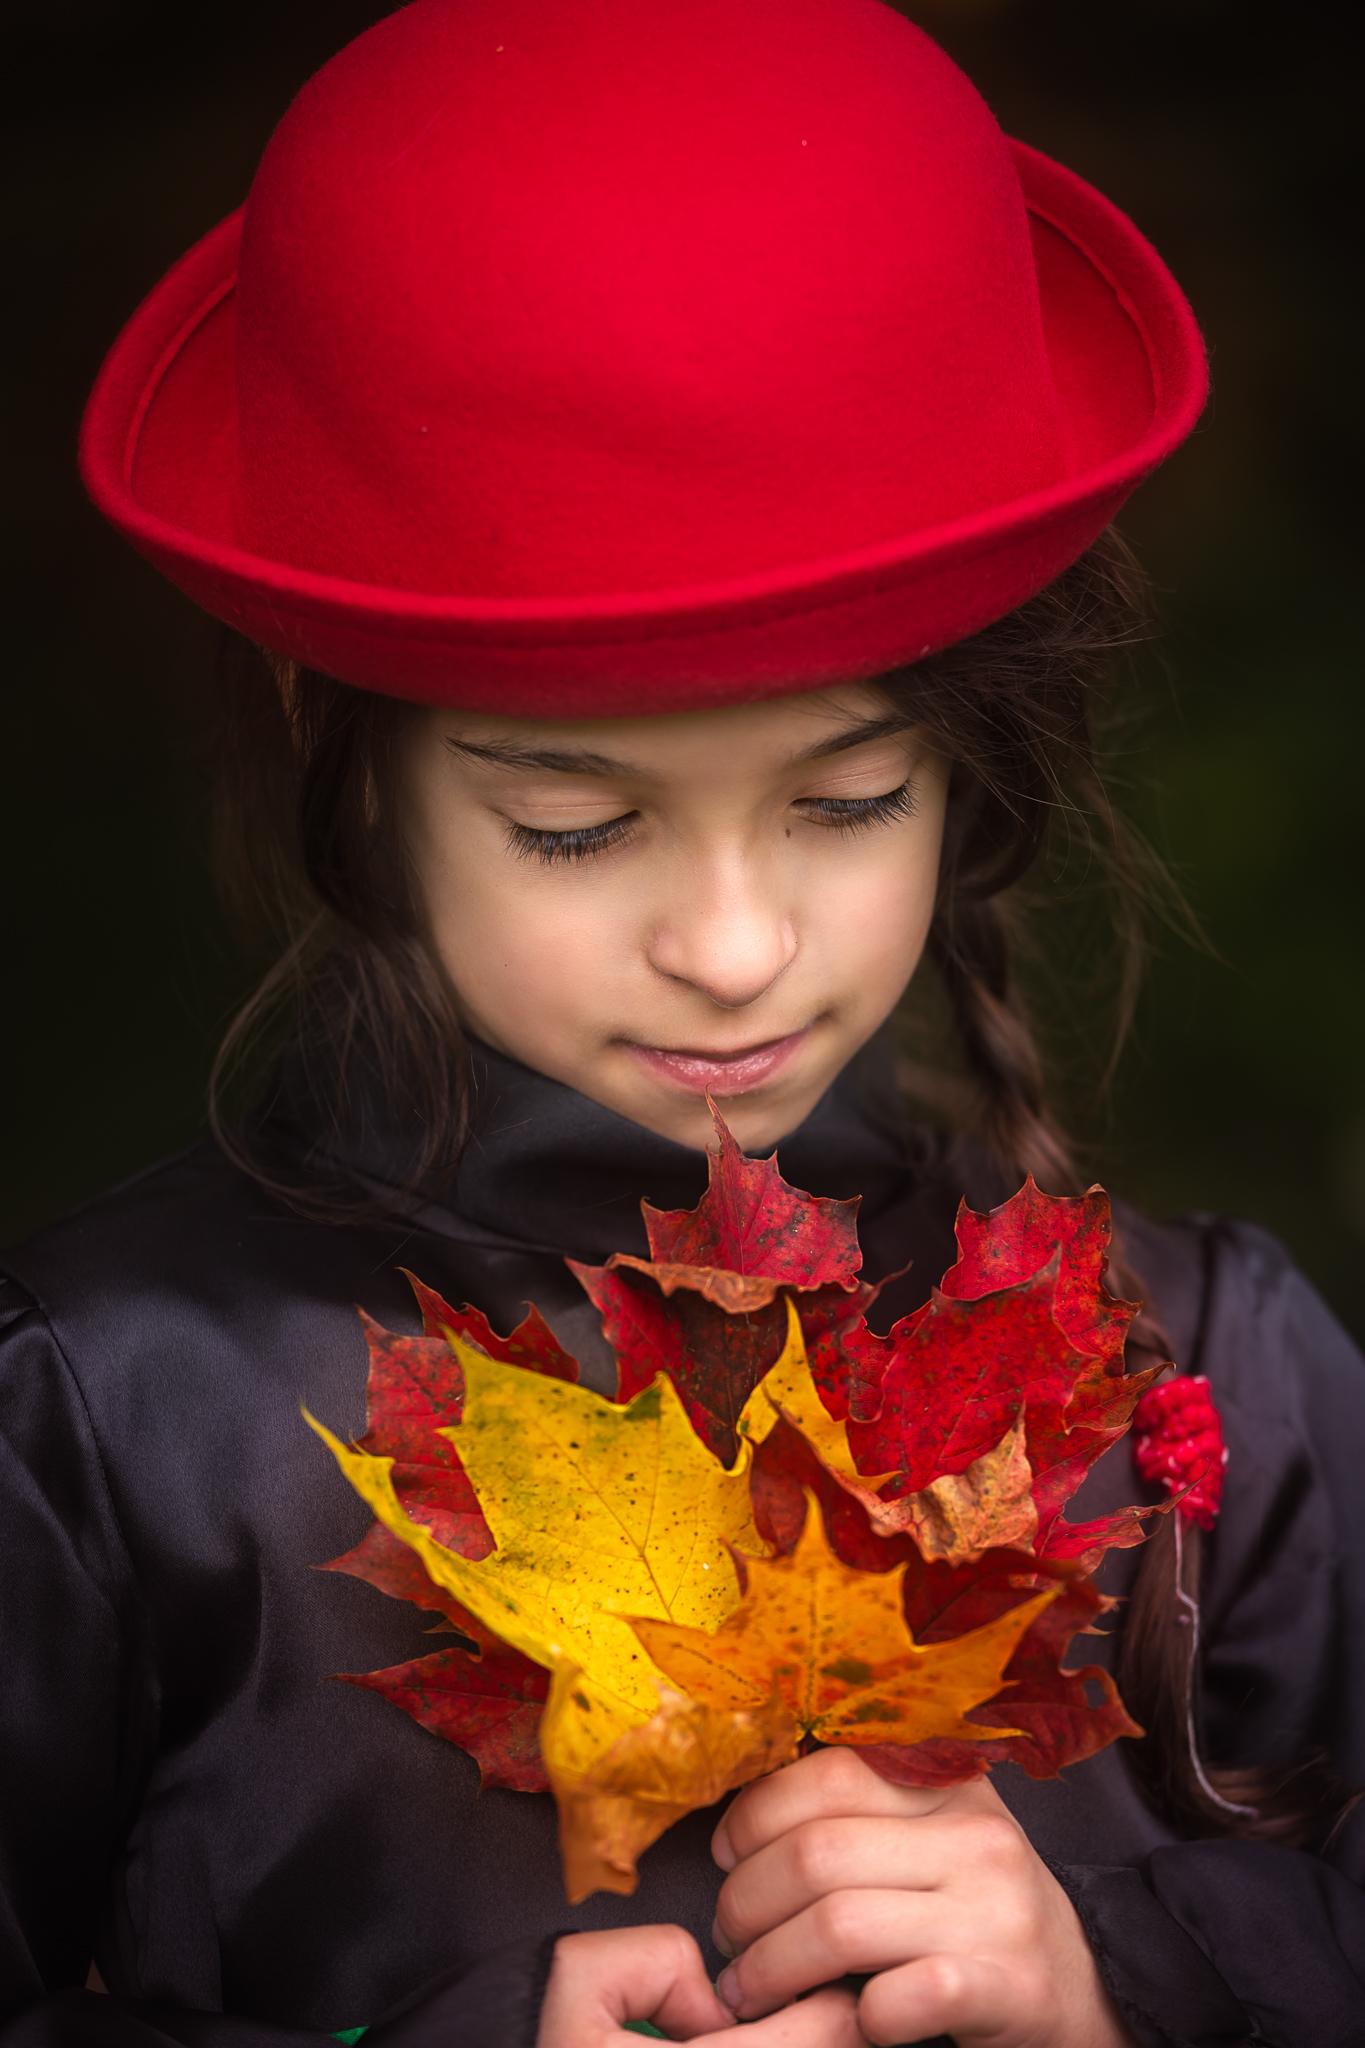 Children photography Leeds, York, Bradford, Harrogate: little girl in a red hat holding autumn leaves. Child autumn session in Leeds, Yorkshire